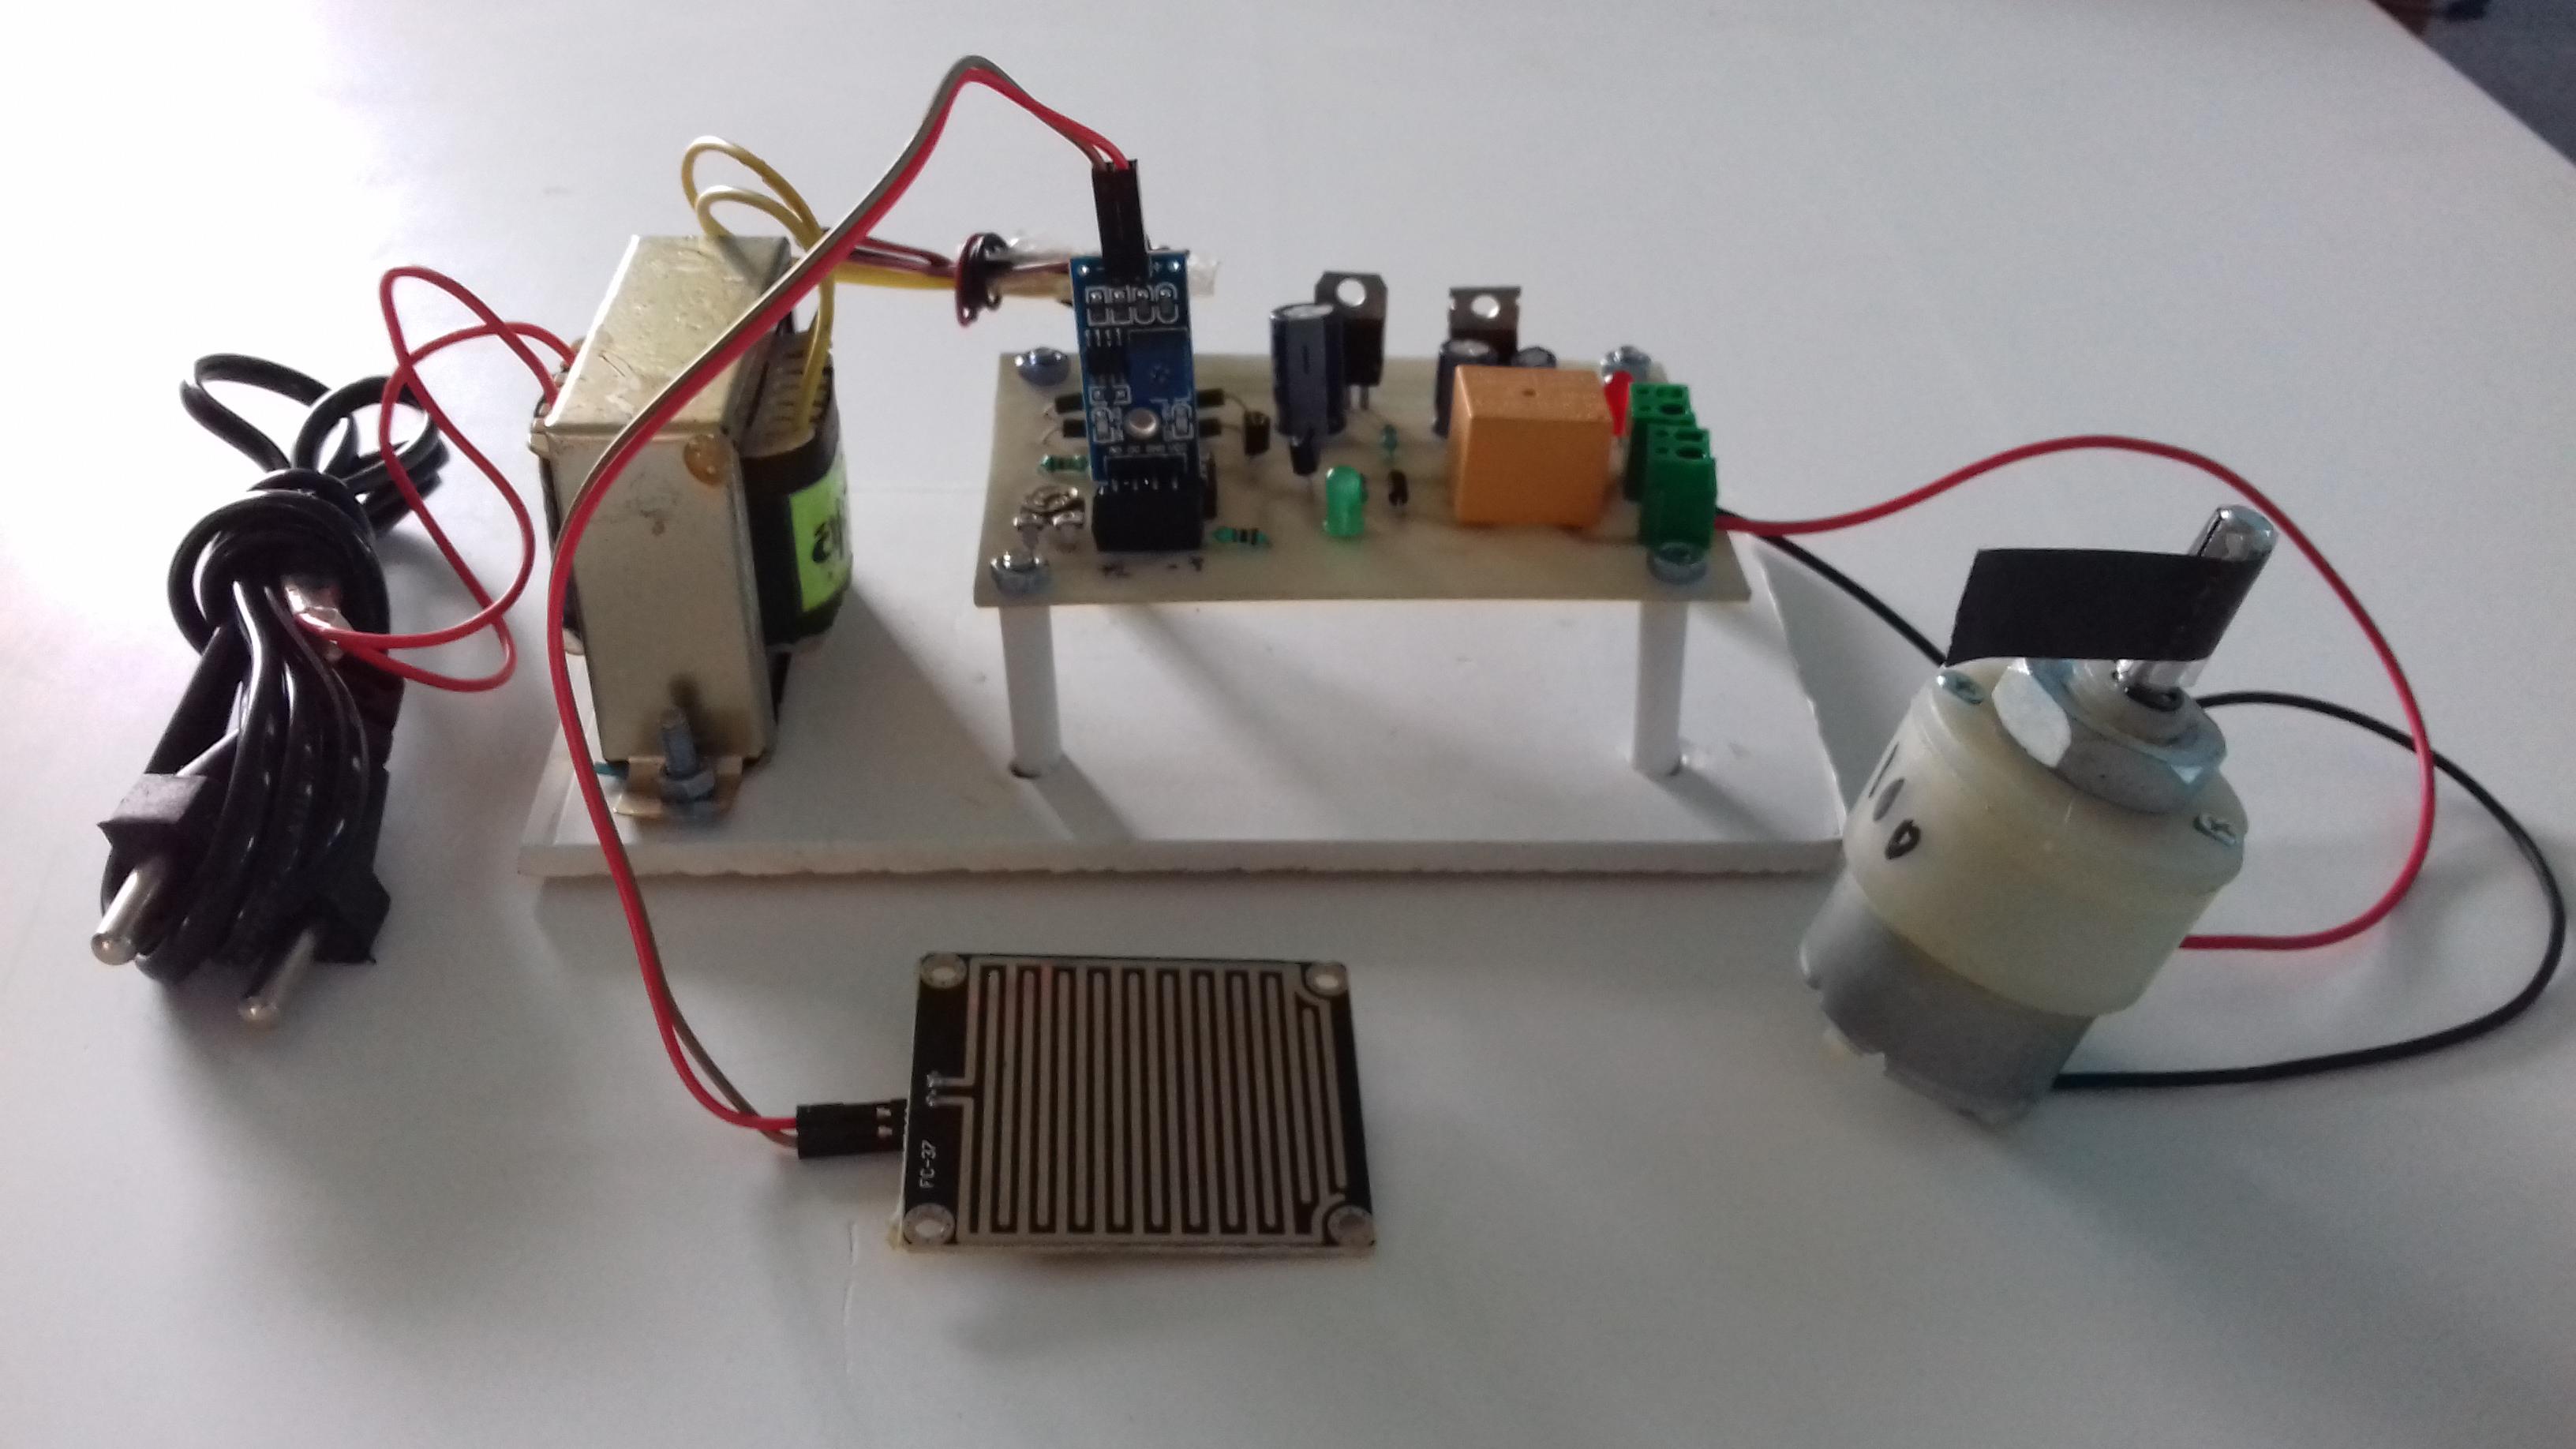 Automatic Wiper System Electrosal Rain Sensing Windshield Control Circuit Diagram Prev